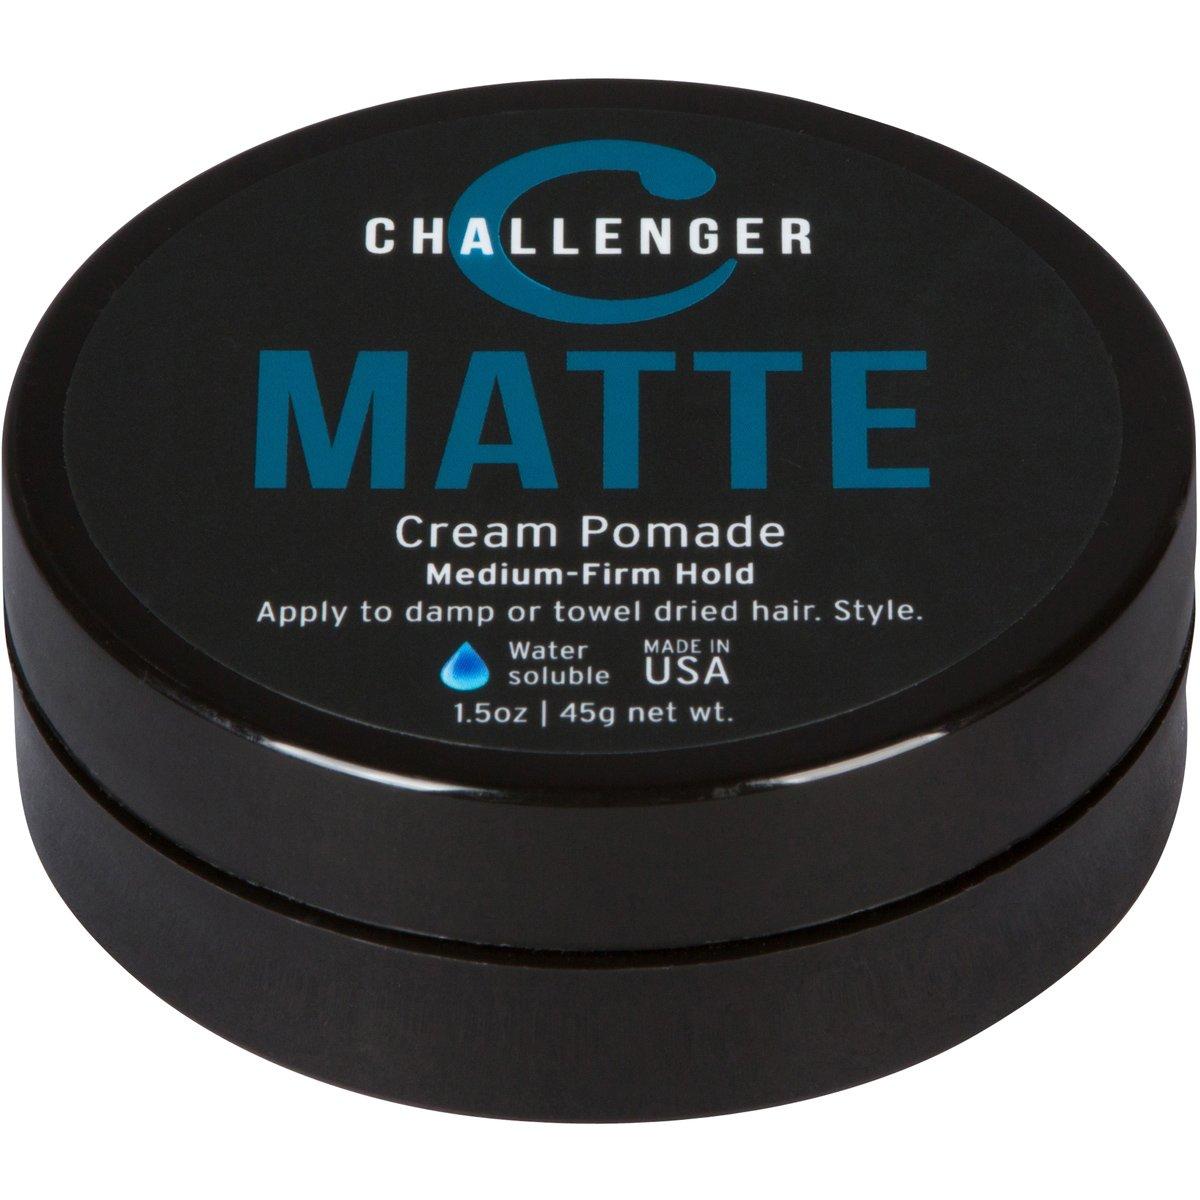 Matte Cream Pomade - Challenger 1.5oz Medium Firm